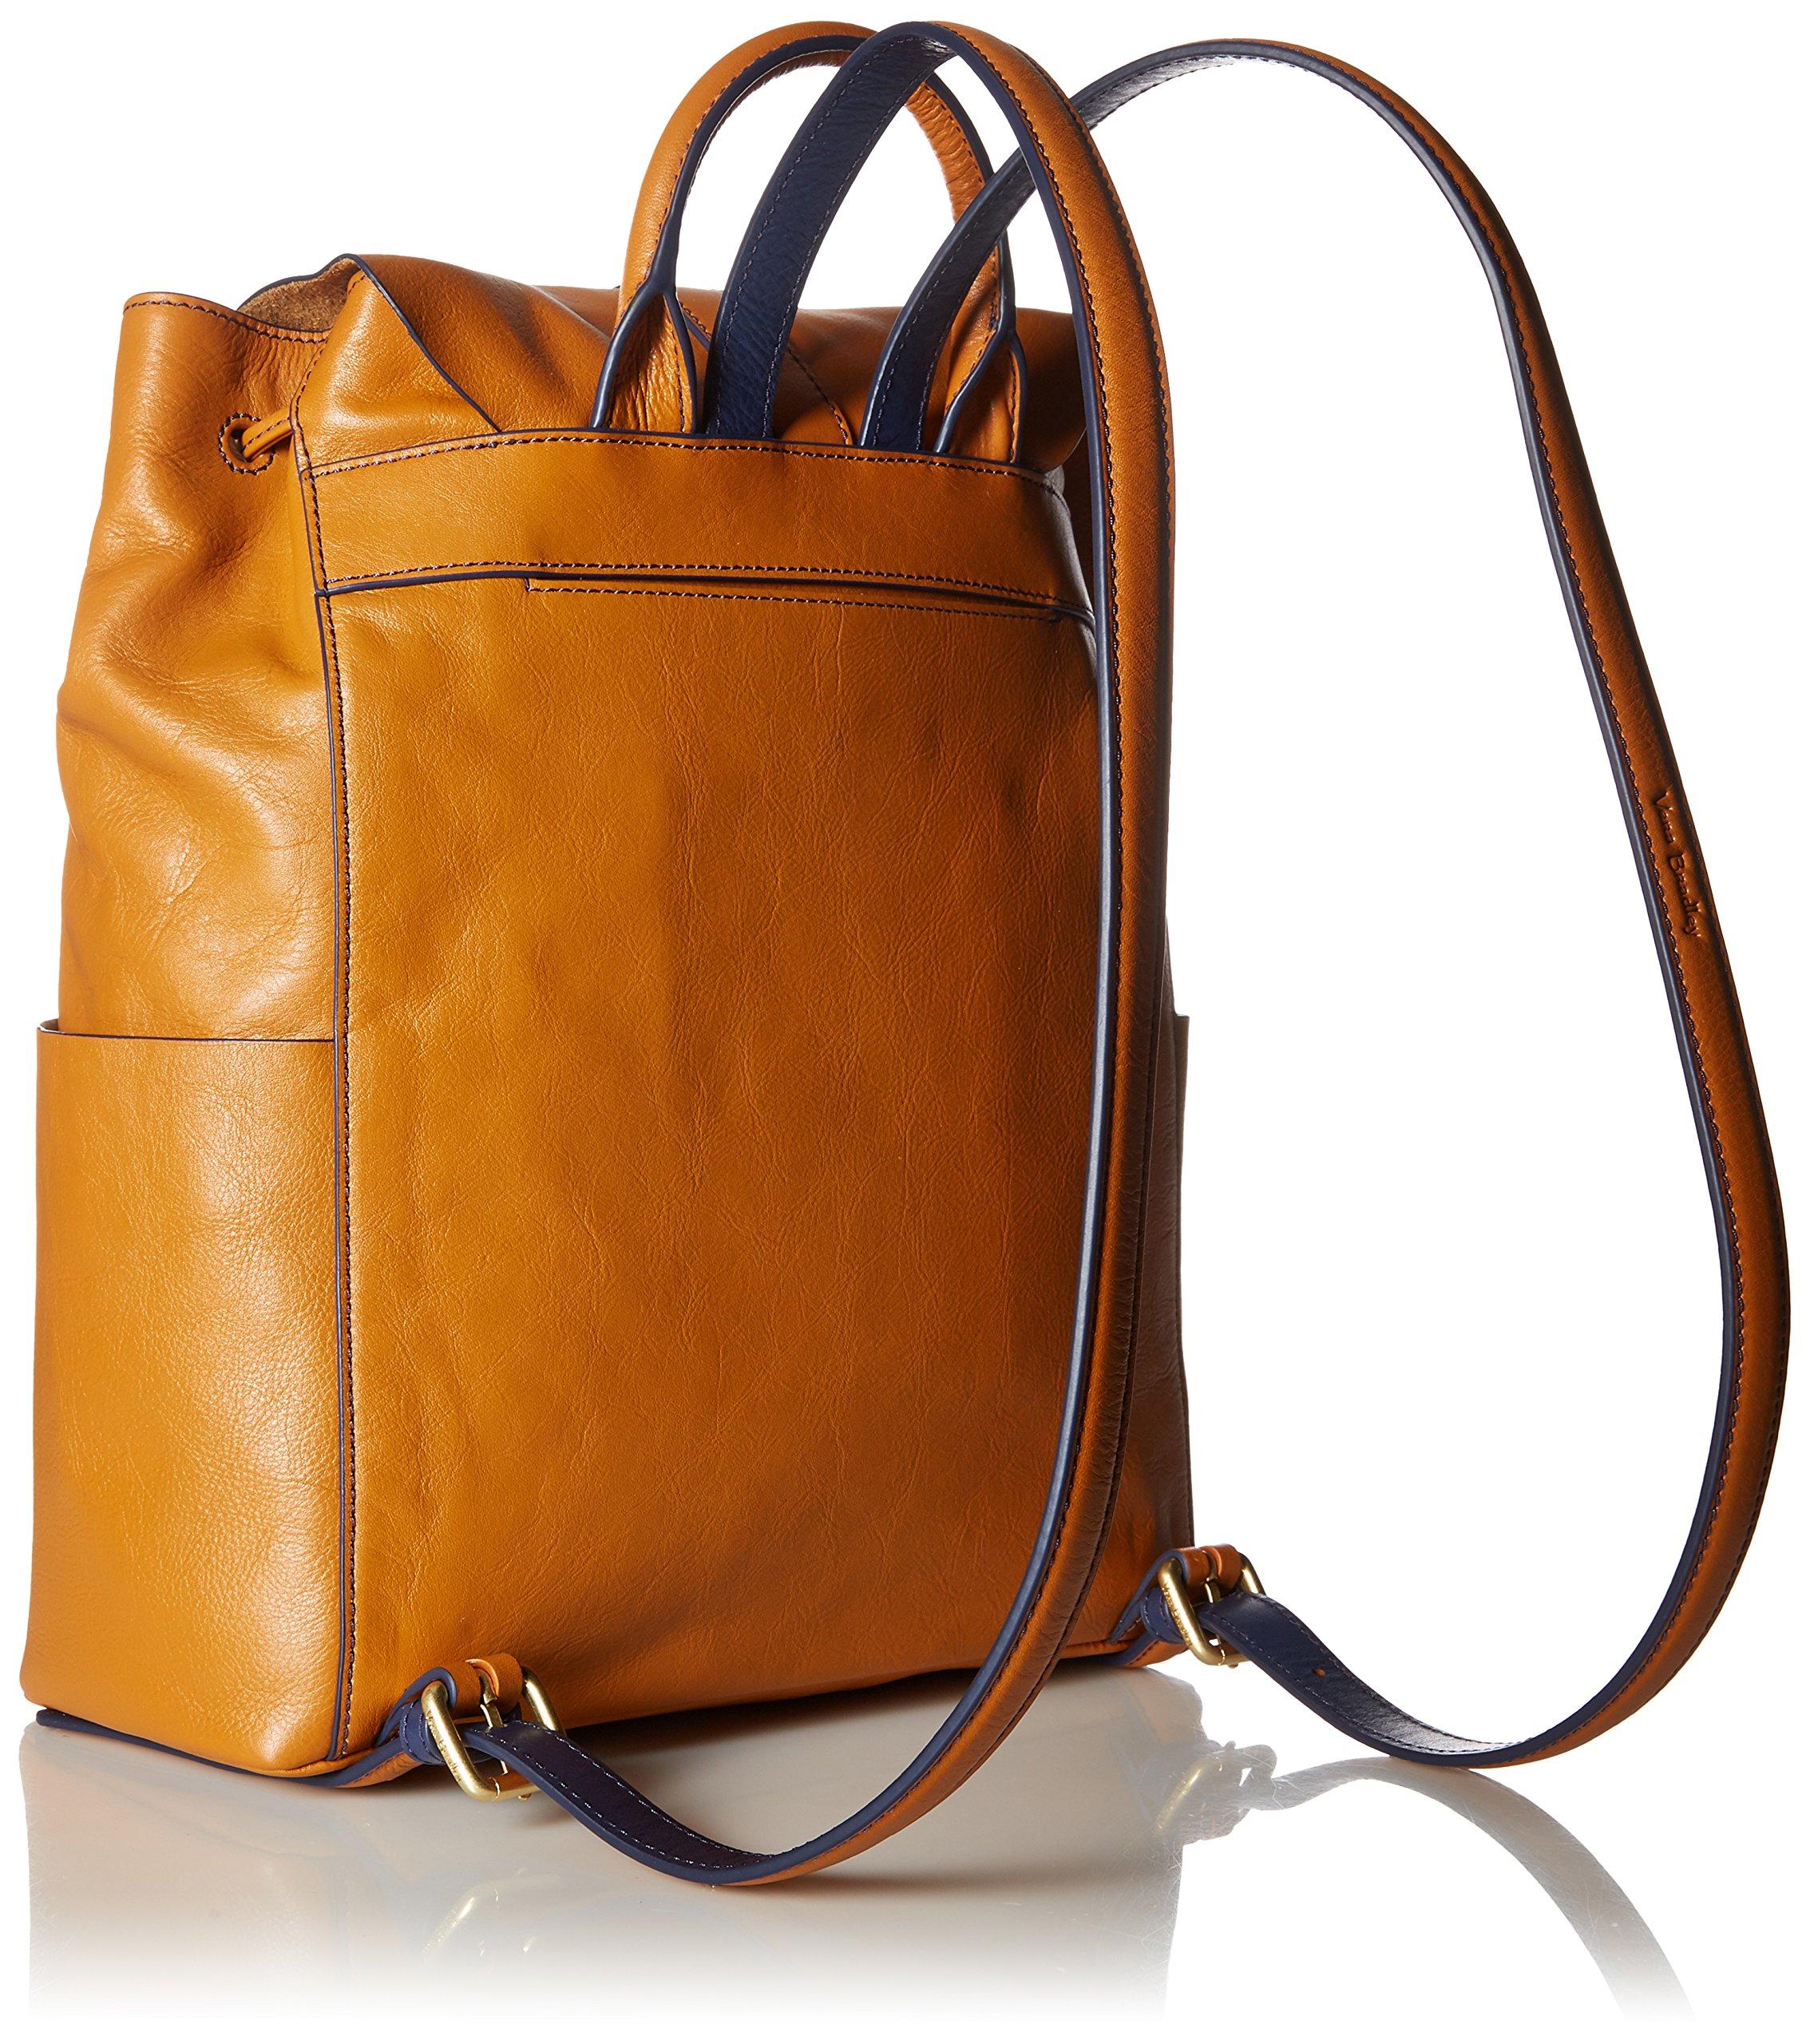 Vera Bradley Women's Big Sky Backpack, Golden Tan by Vera Bradley (Image #2)